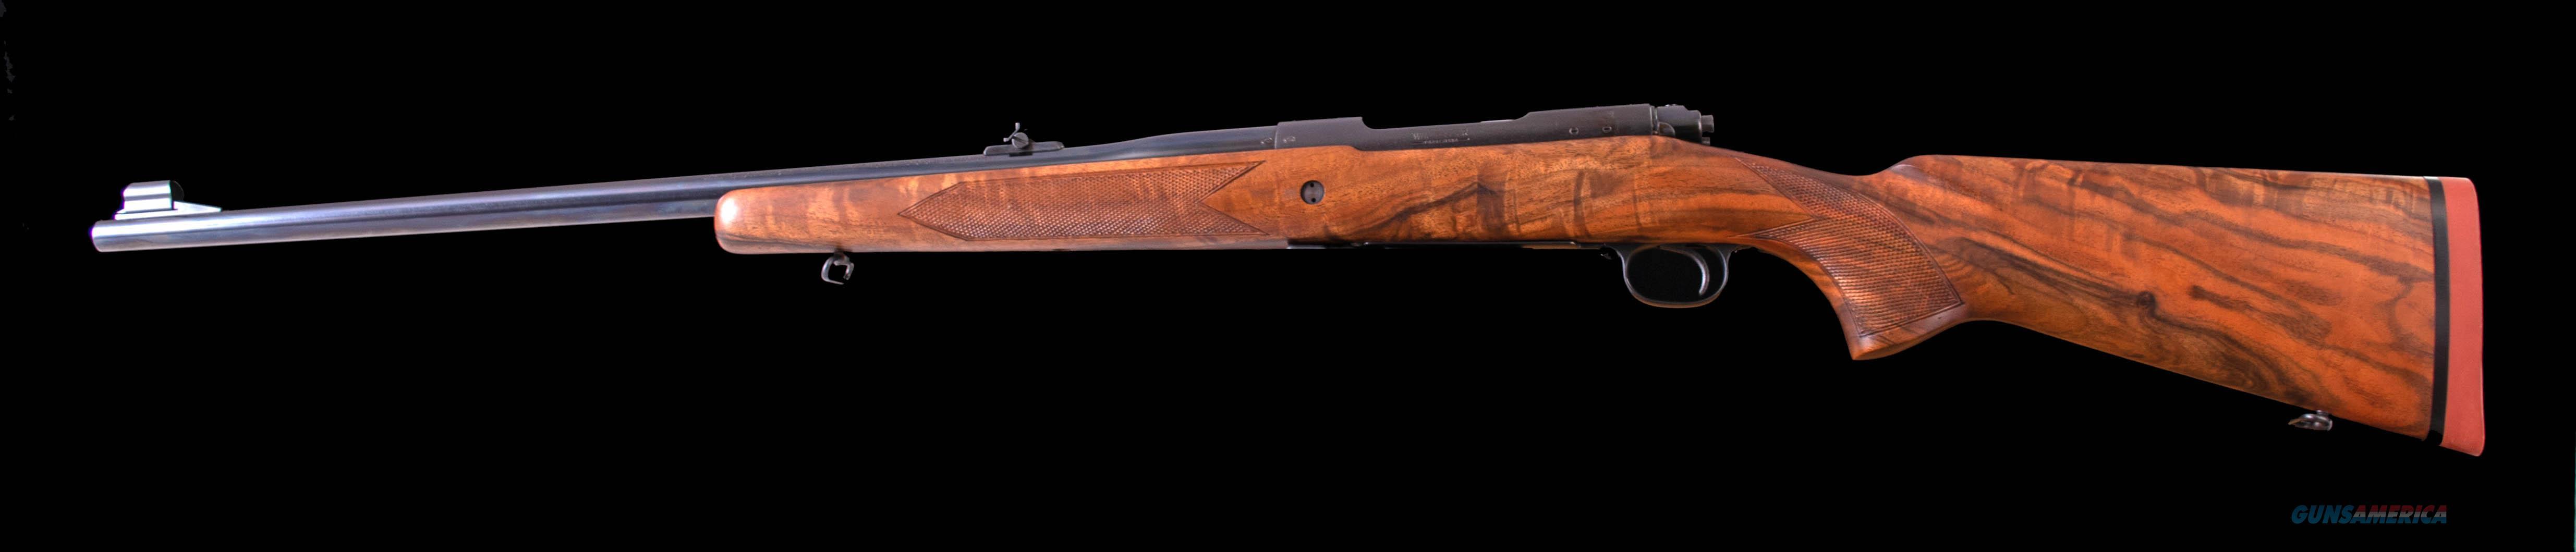 Winchester Pre-'64 Model 70 .375 H & H – 1956, CUSTOM WOOD, vintage firearms inc  Guns > Rifles > Winchester Rifles - Modern Bolt/Auto/Single > Model 70 > Pre-64